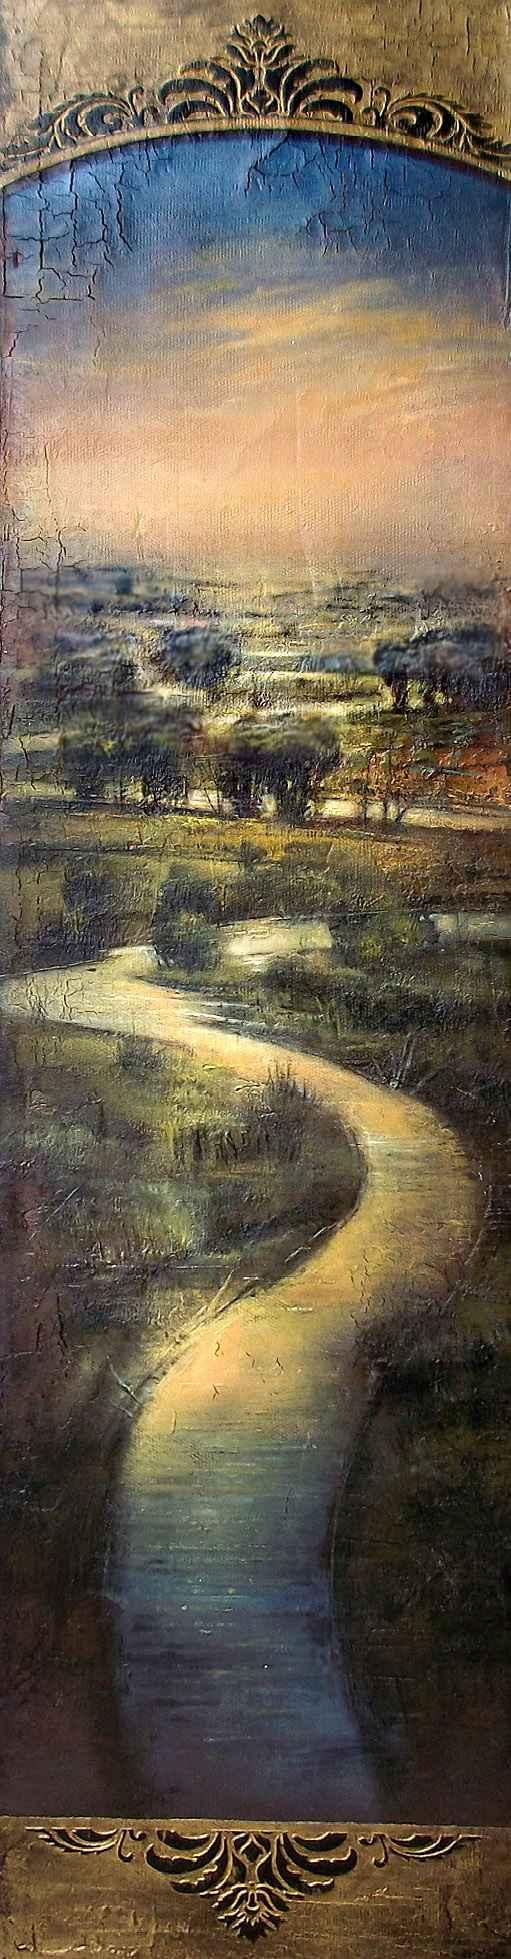 River Run Height